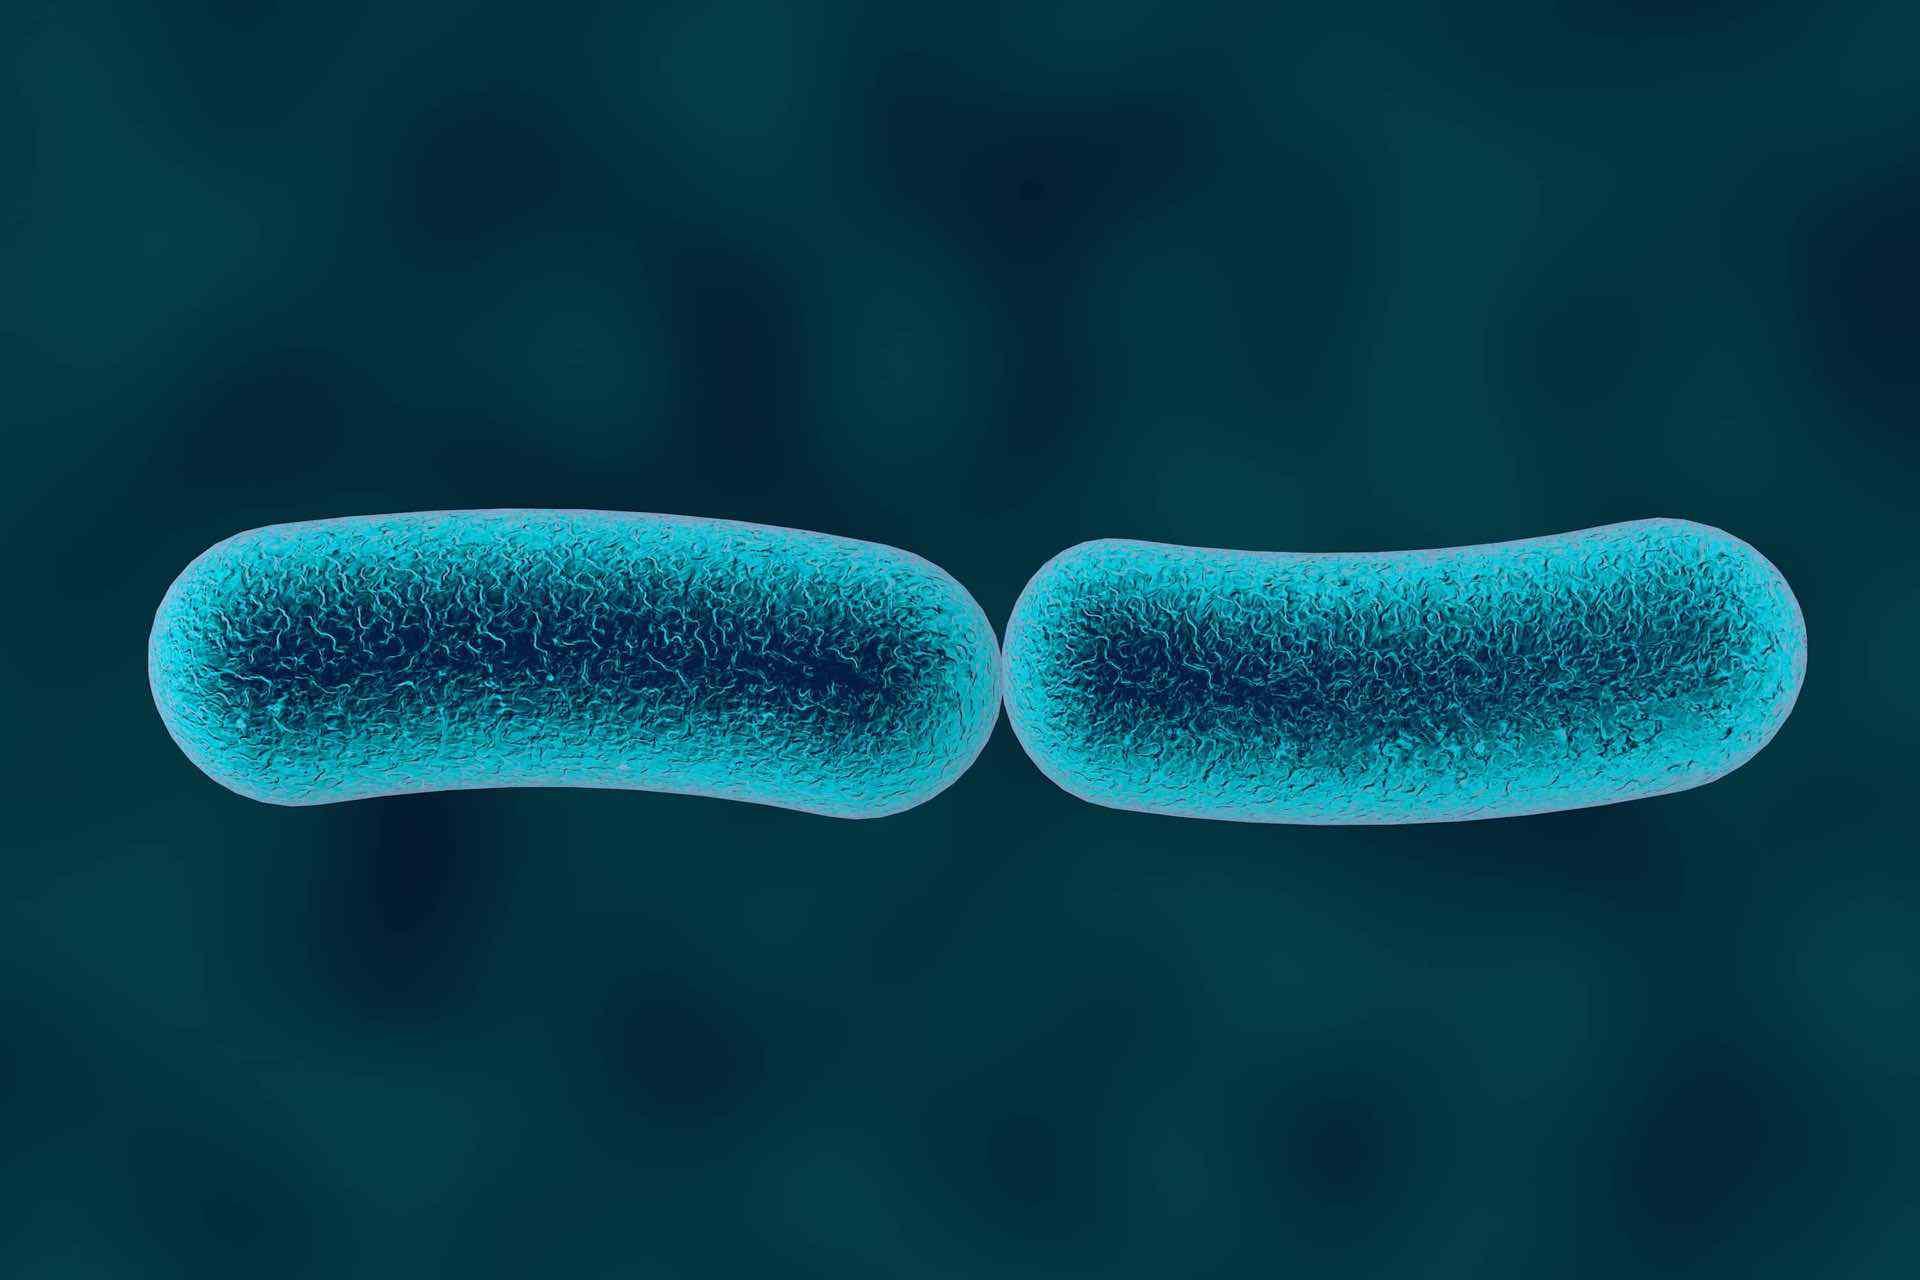 écosystème intestinal